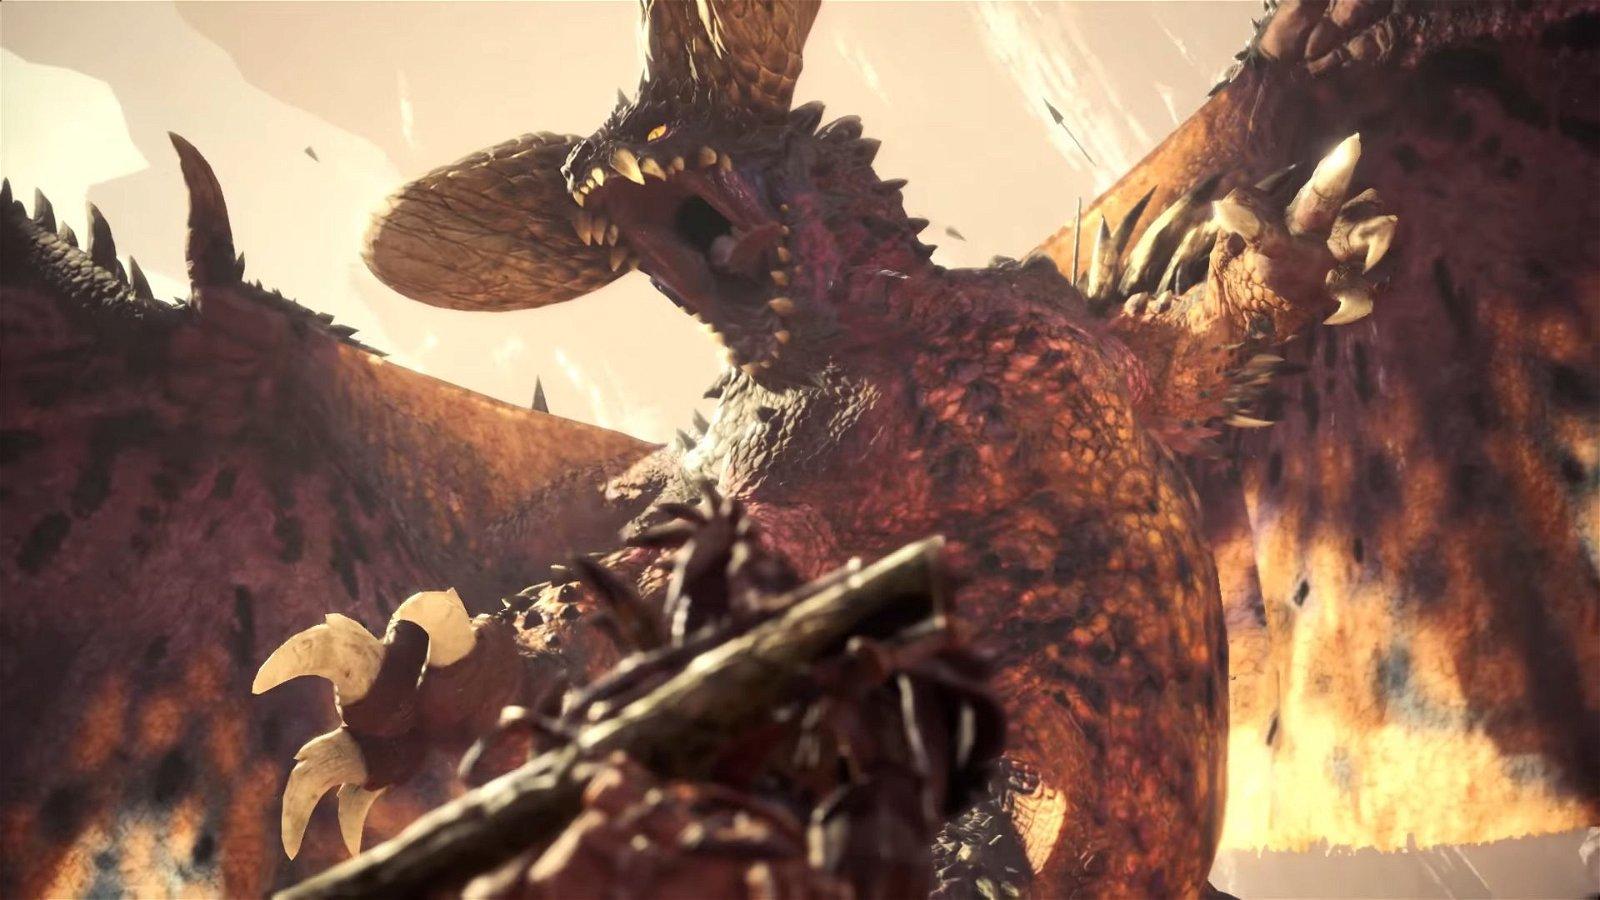 Monster Hunter: World Hits Stores and Digital Platforms Globally 1